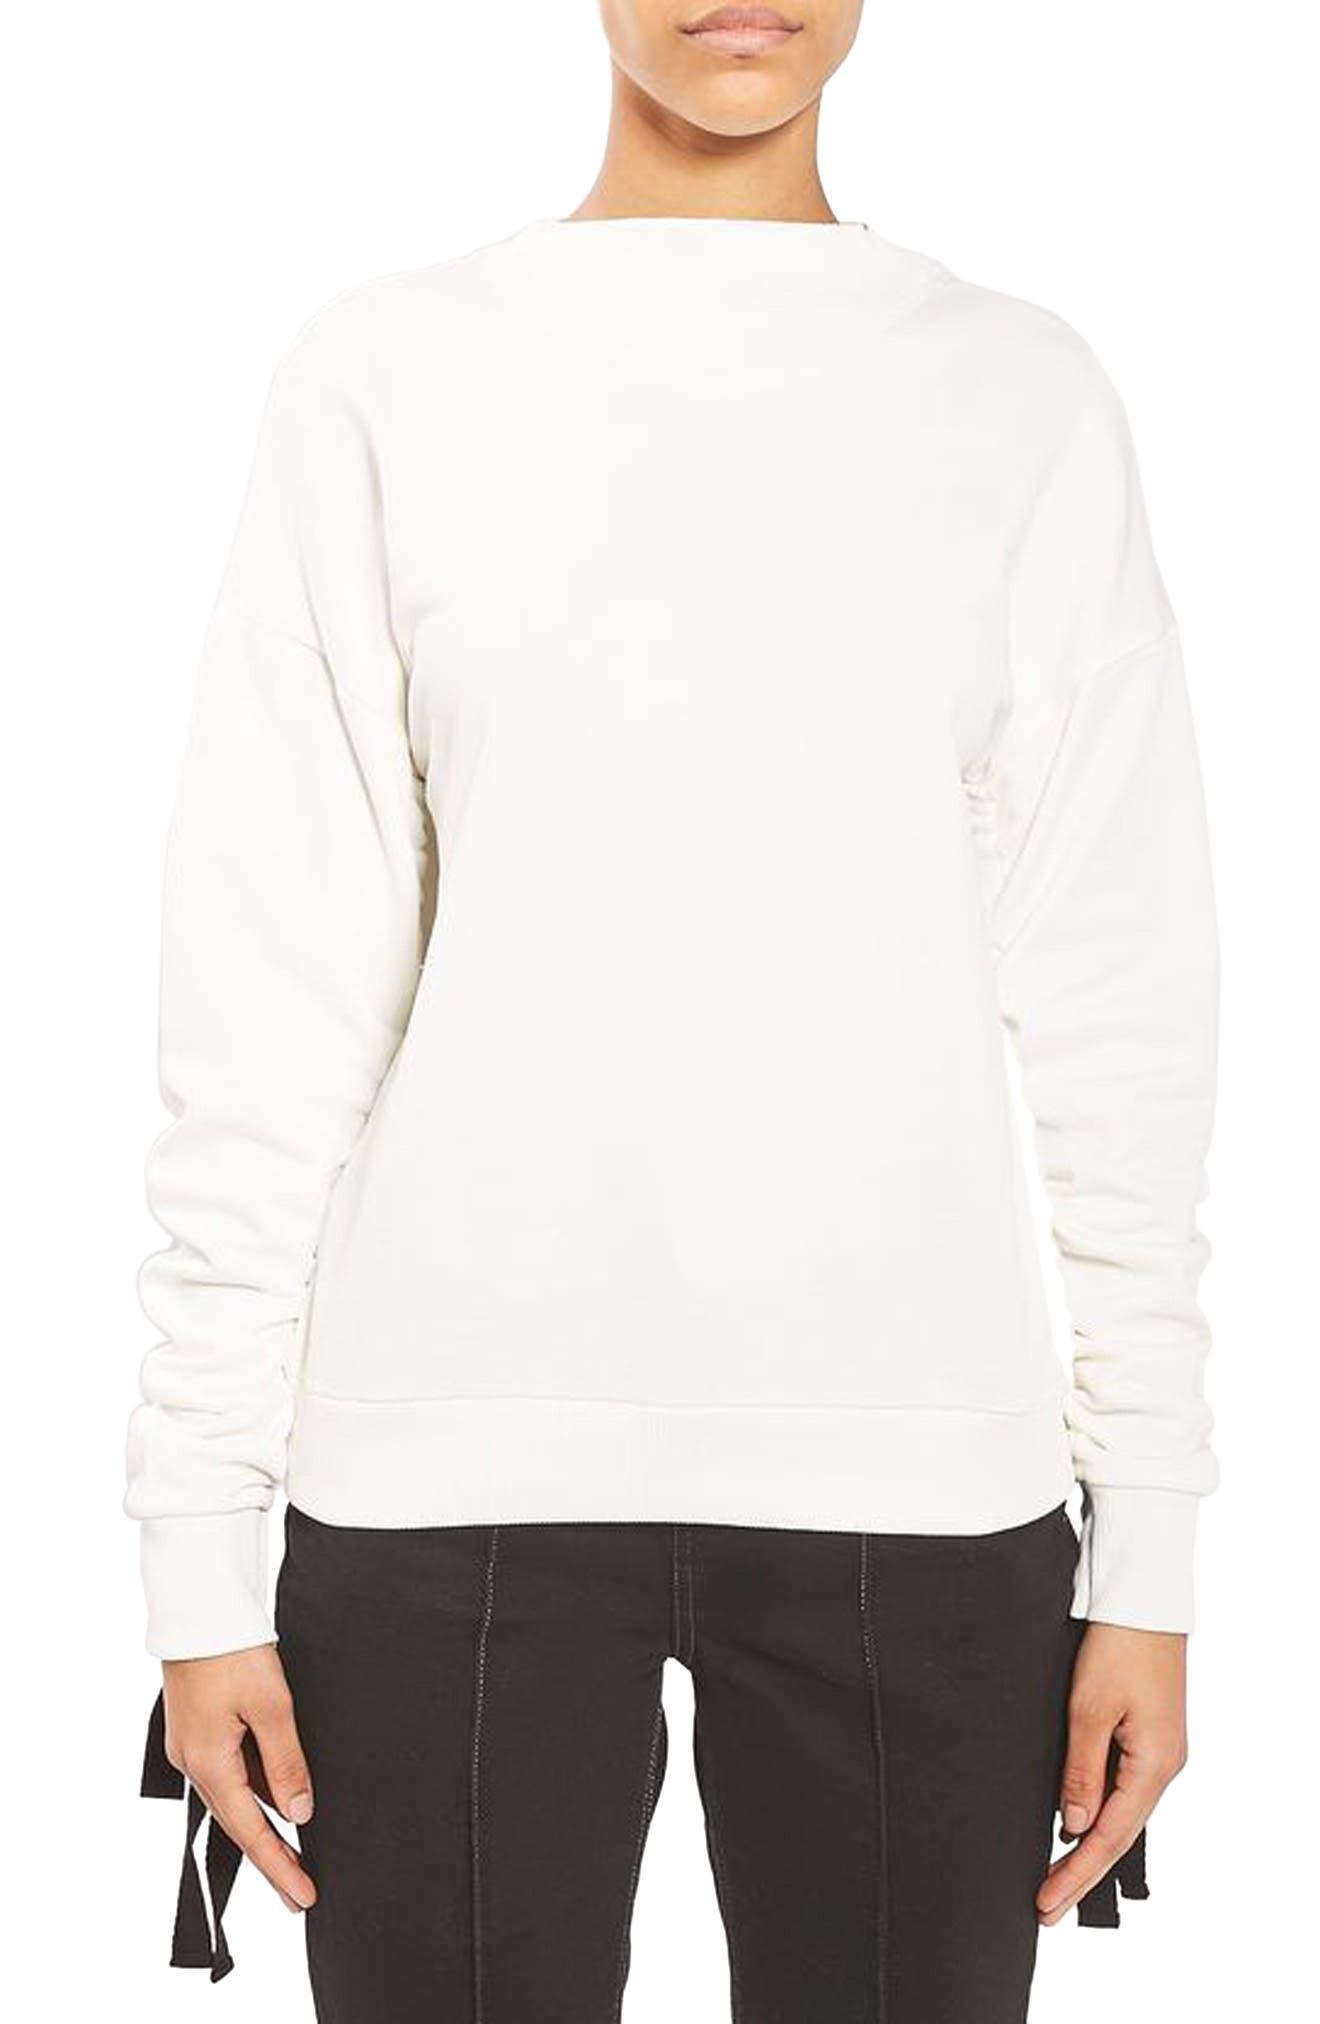 Topshop Boutique Ruched Sweatshirt